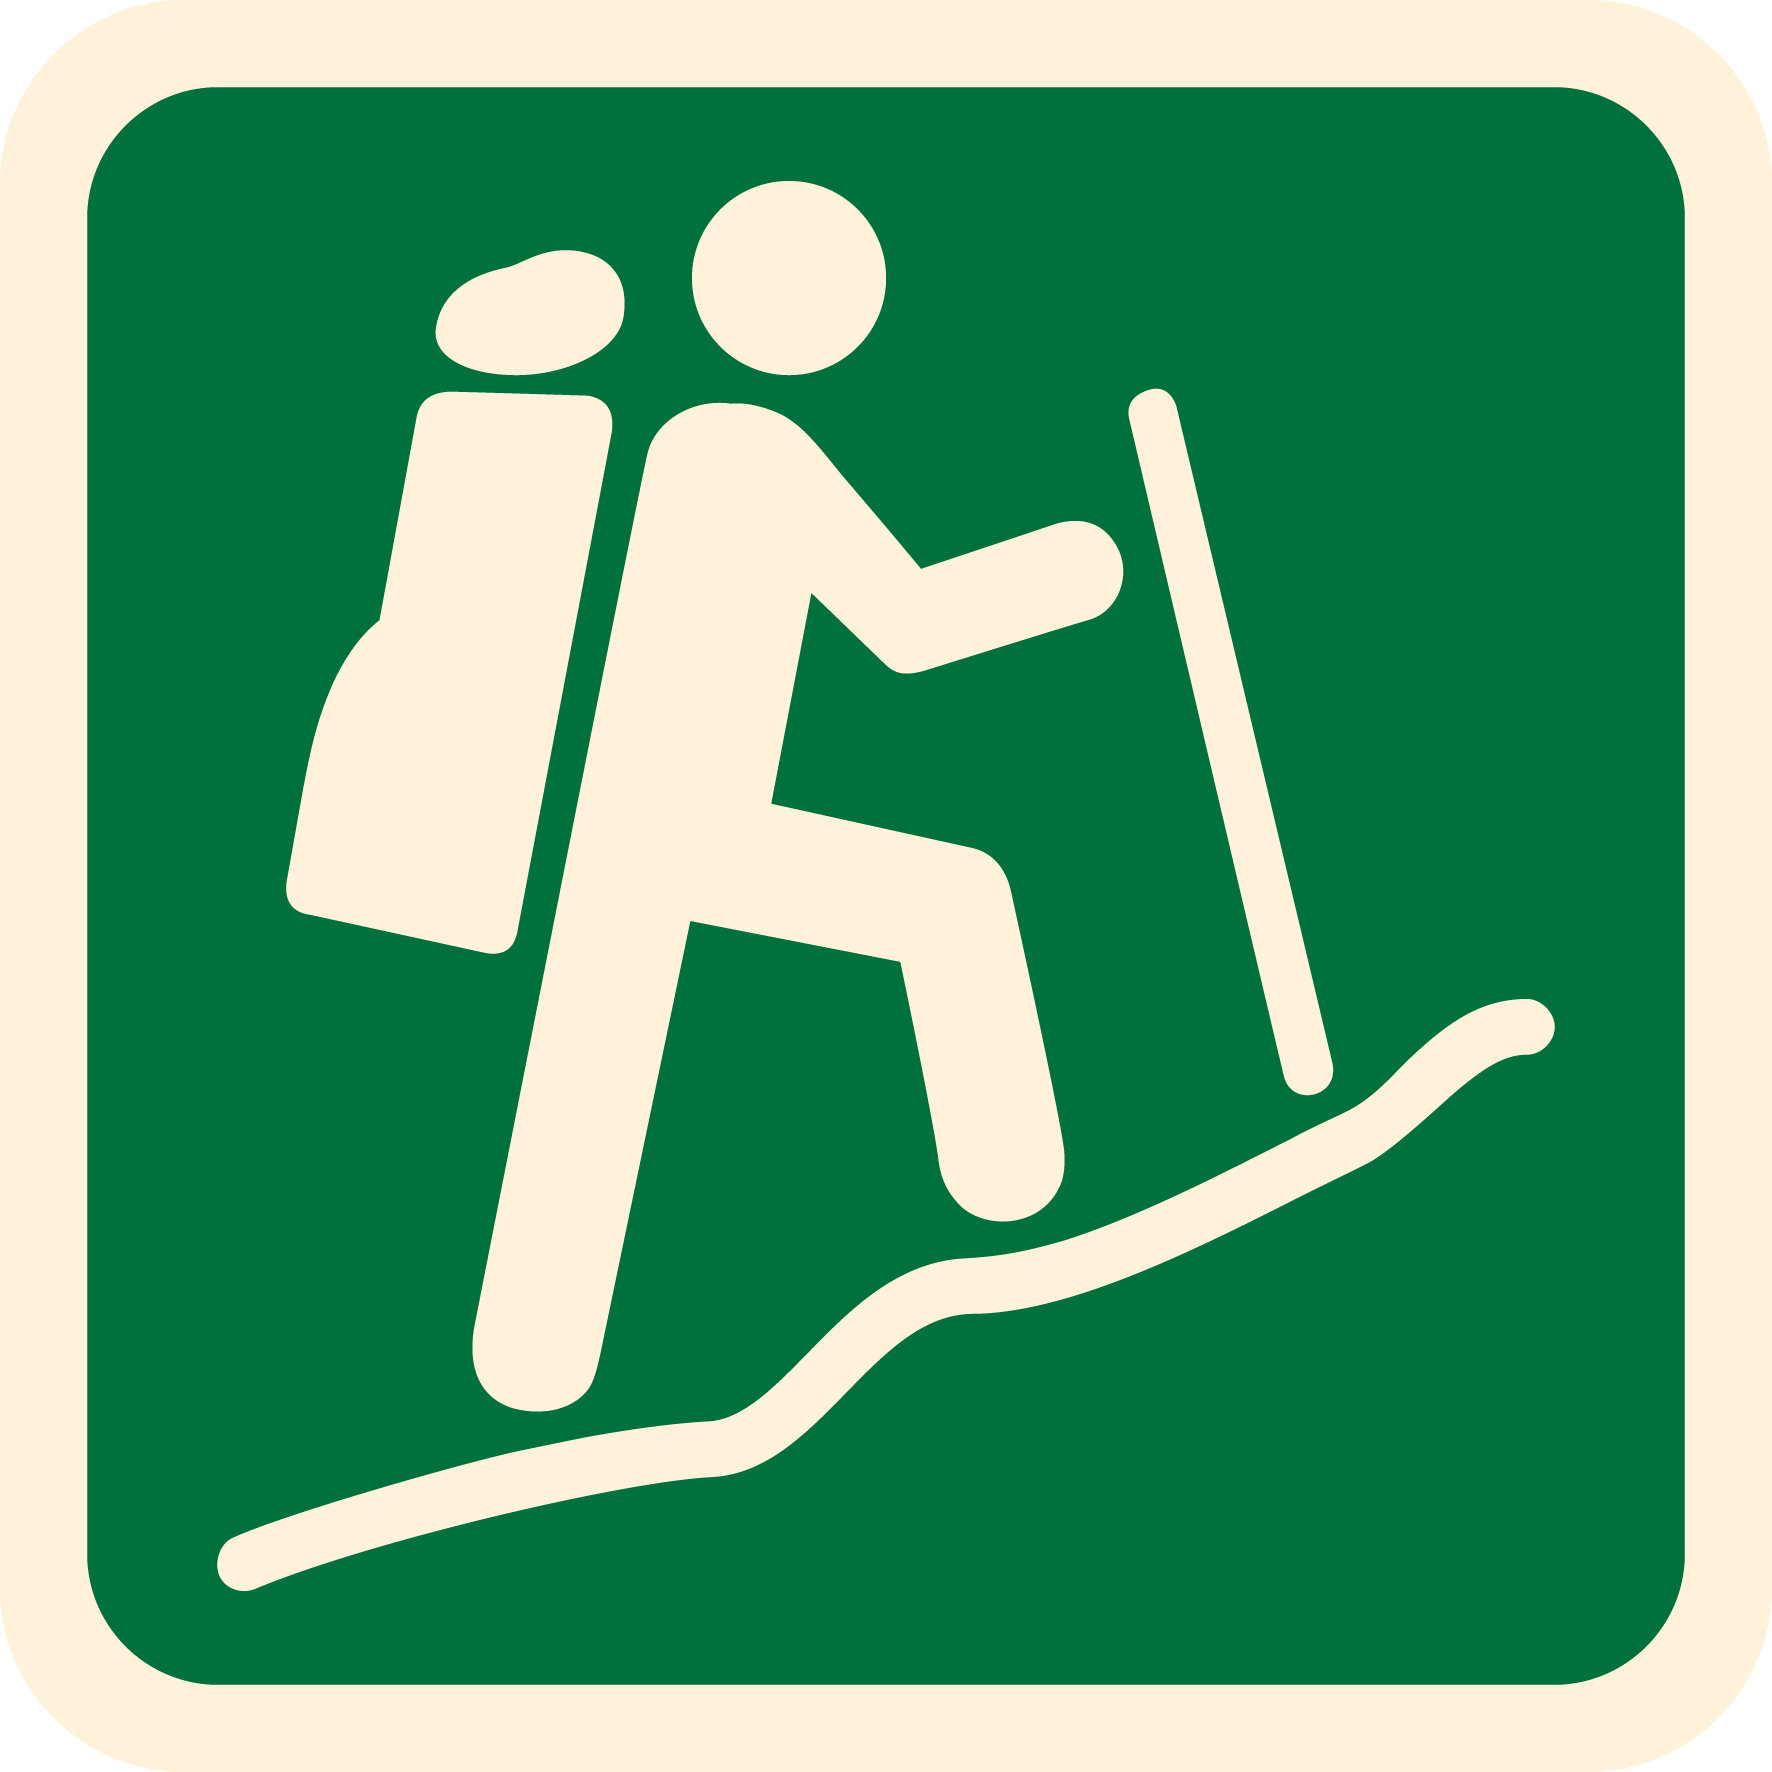 1772x1772 Australian Walking Track Grading System